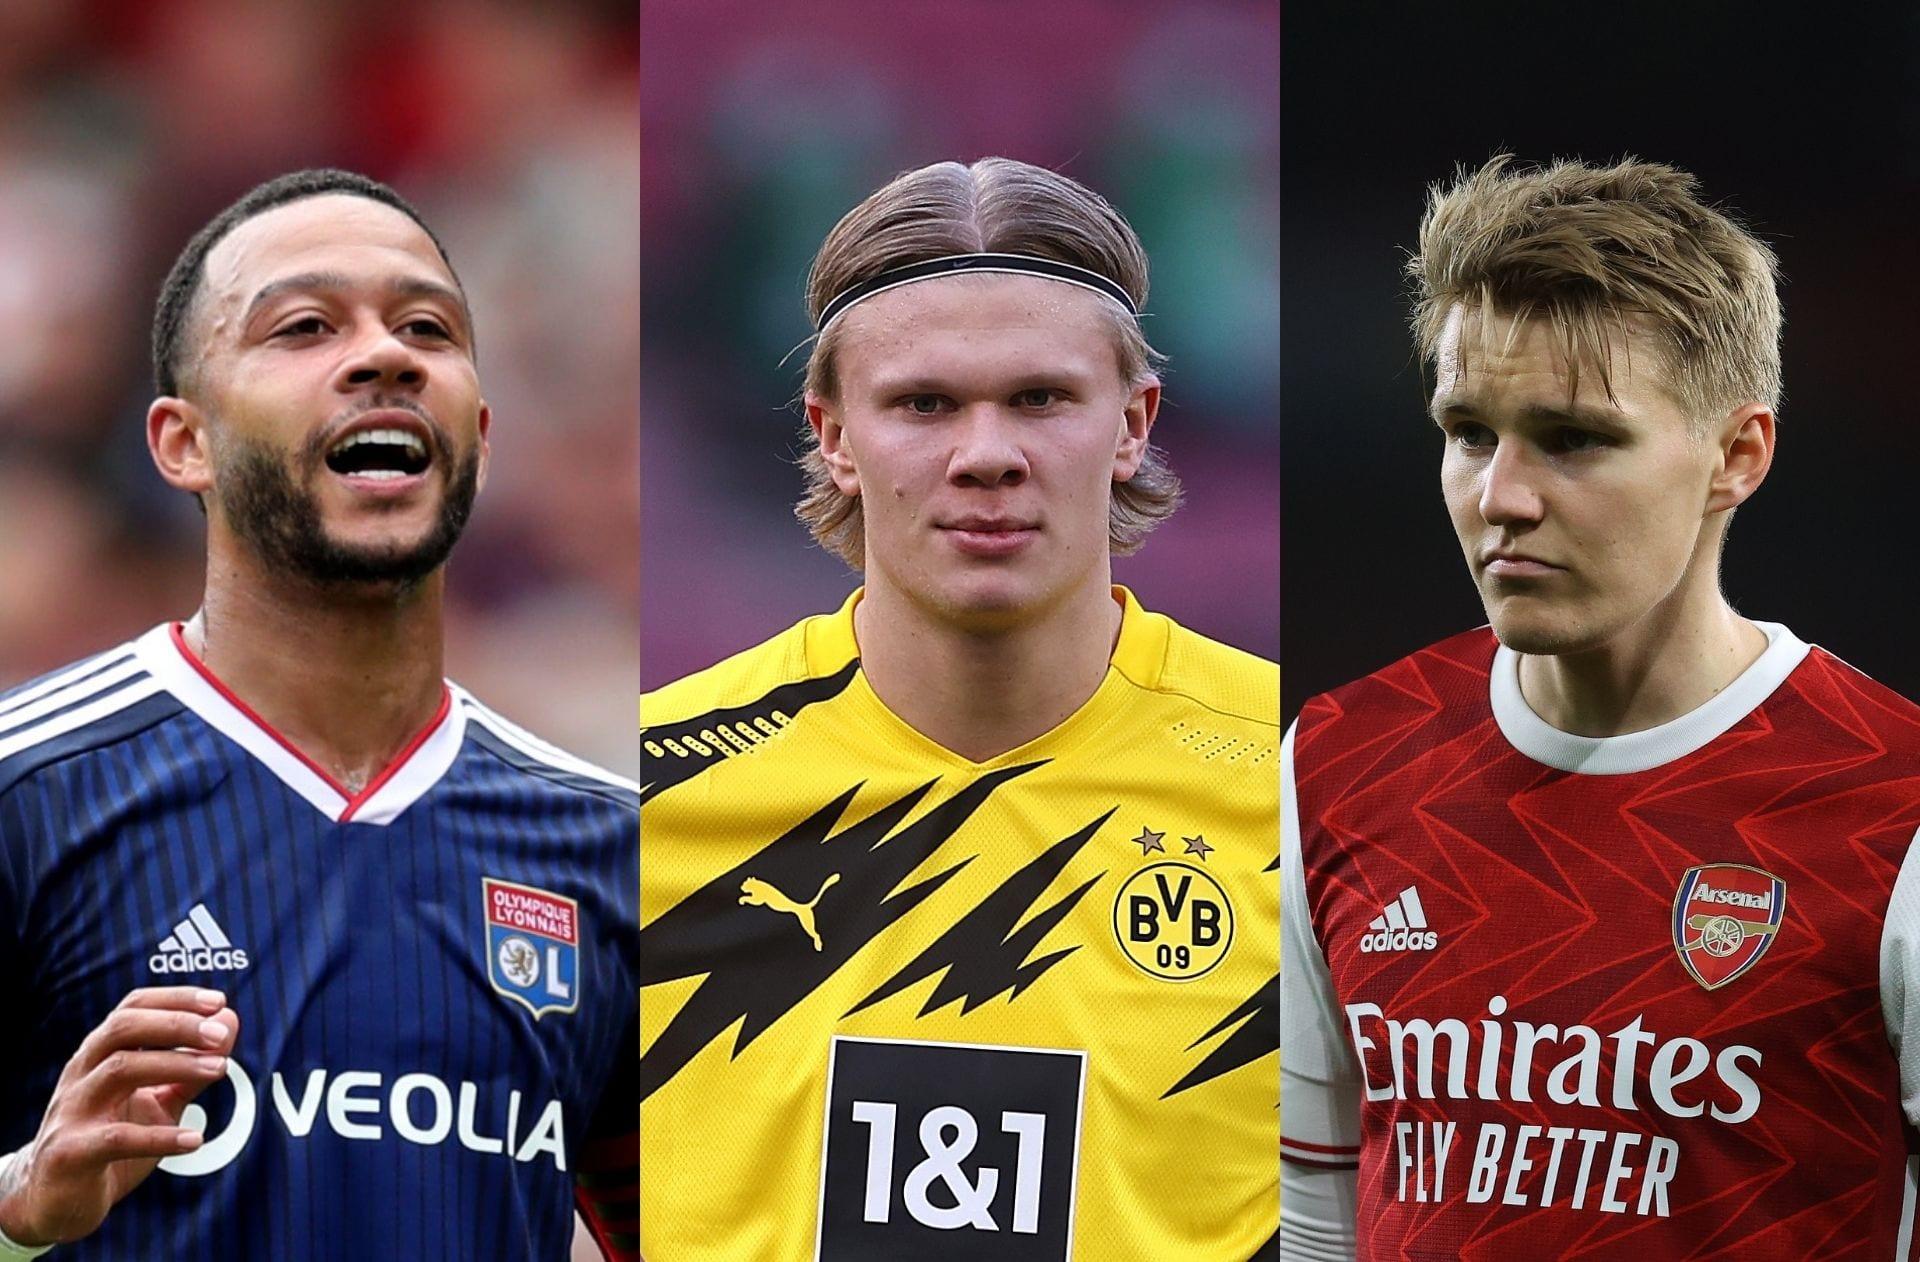 Monday's transfer rumors - Dortmund name their price for Haaland